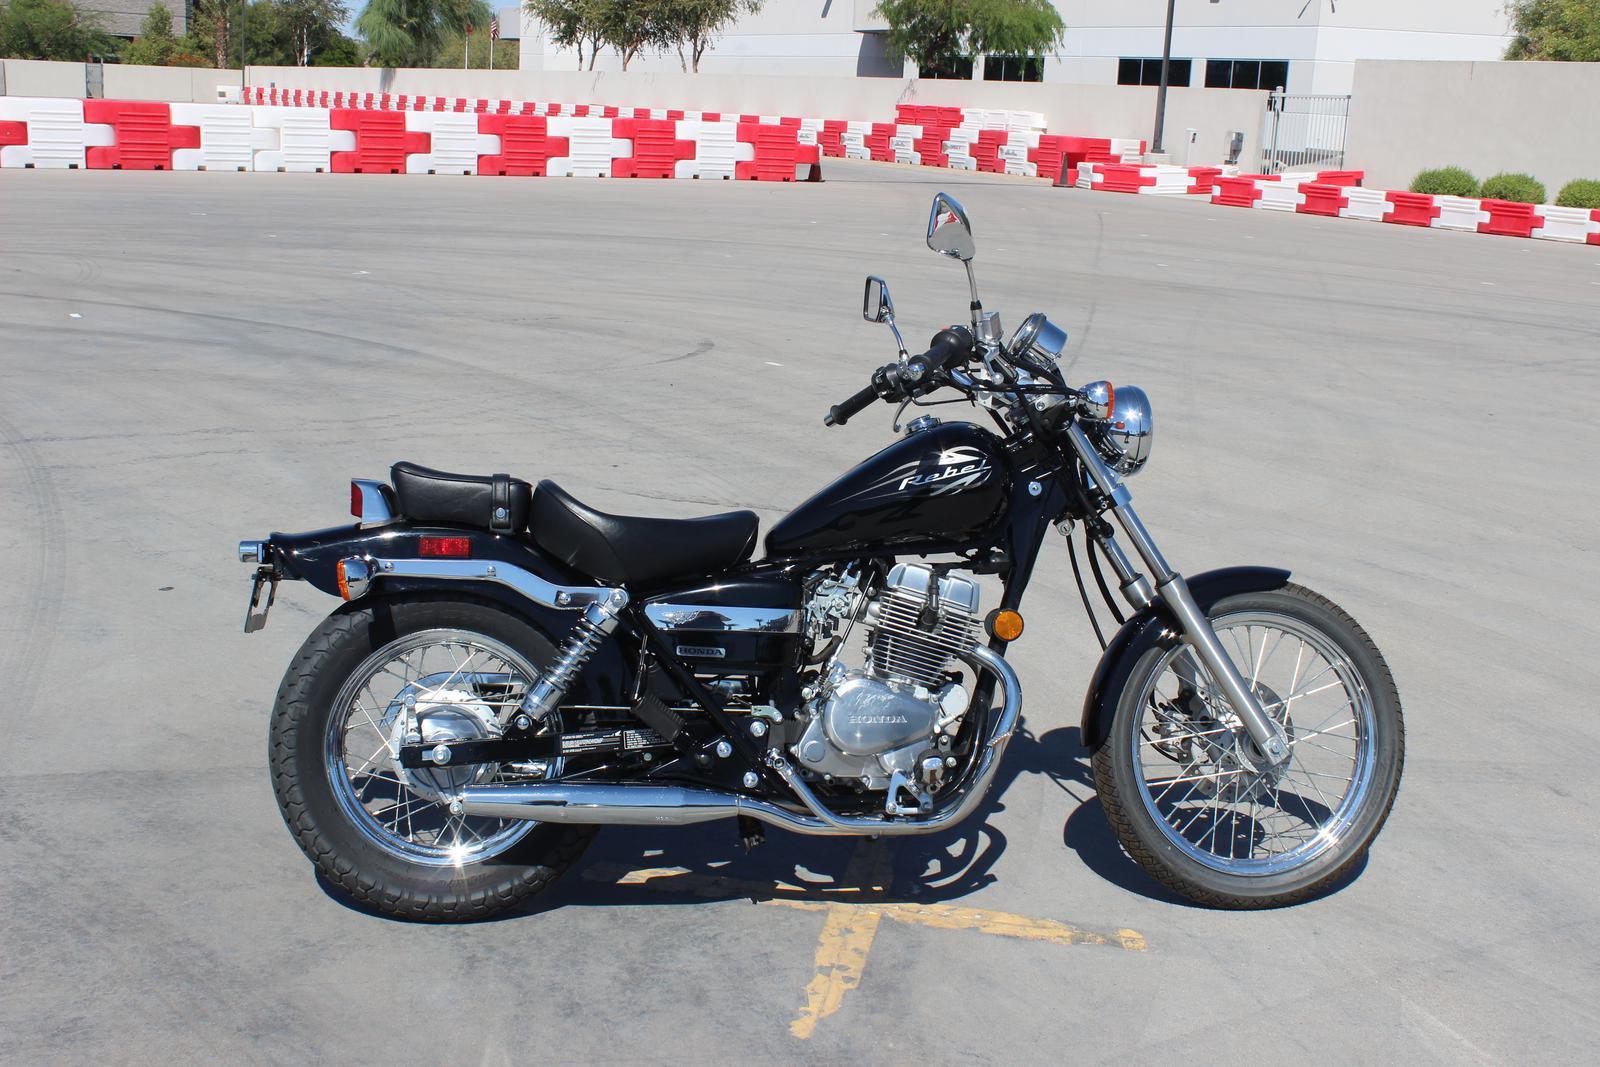 2016 Honda Rebel 250 For Sale In Scottsdale Az Go Az Motorcycles